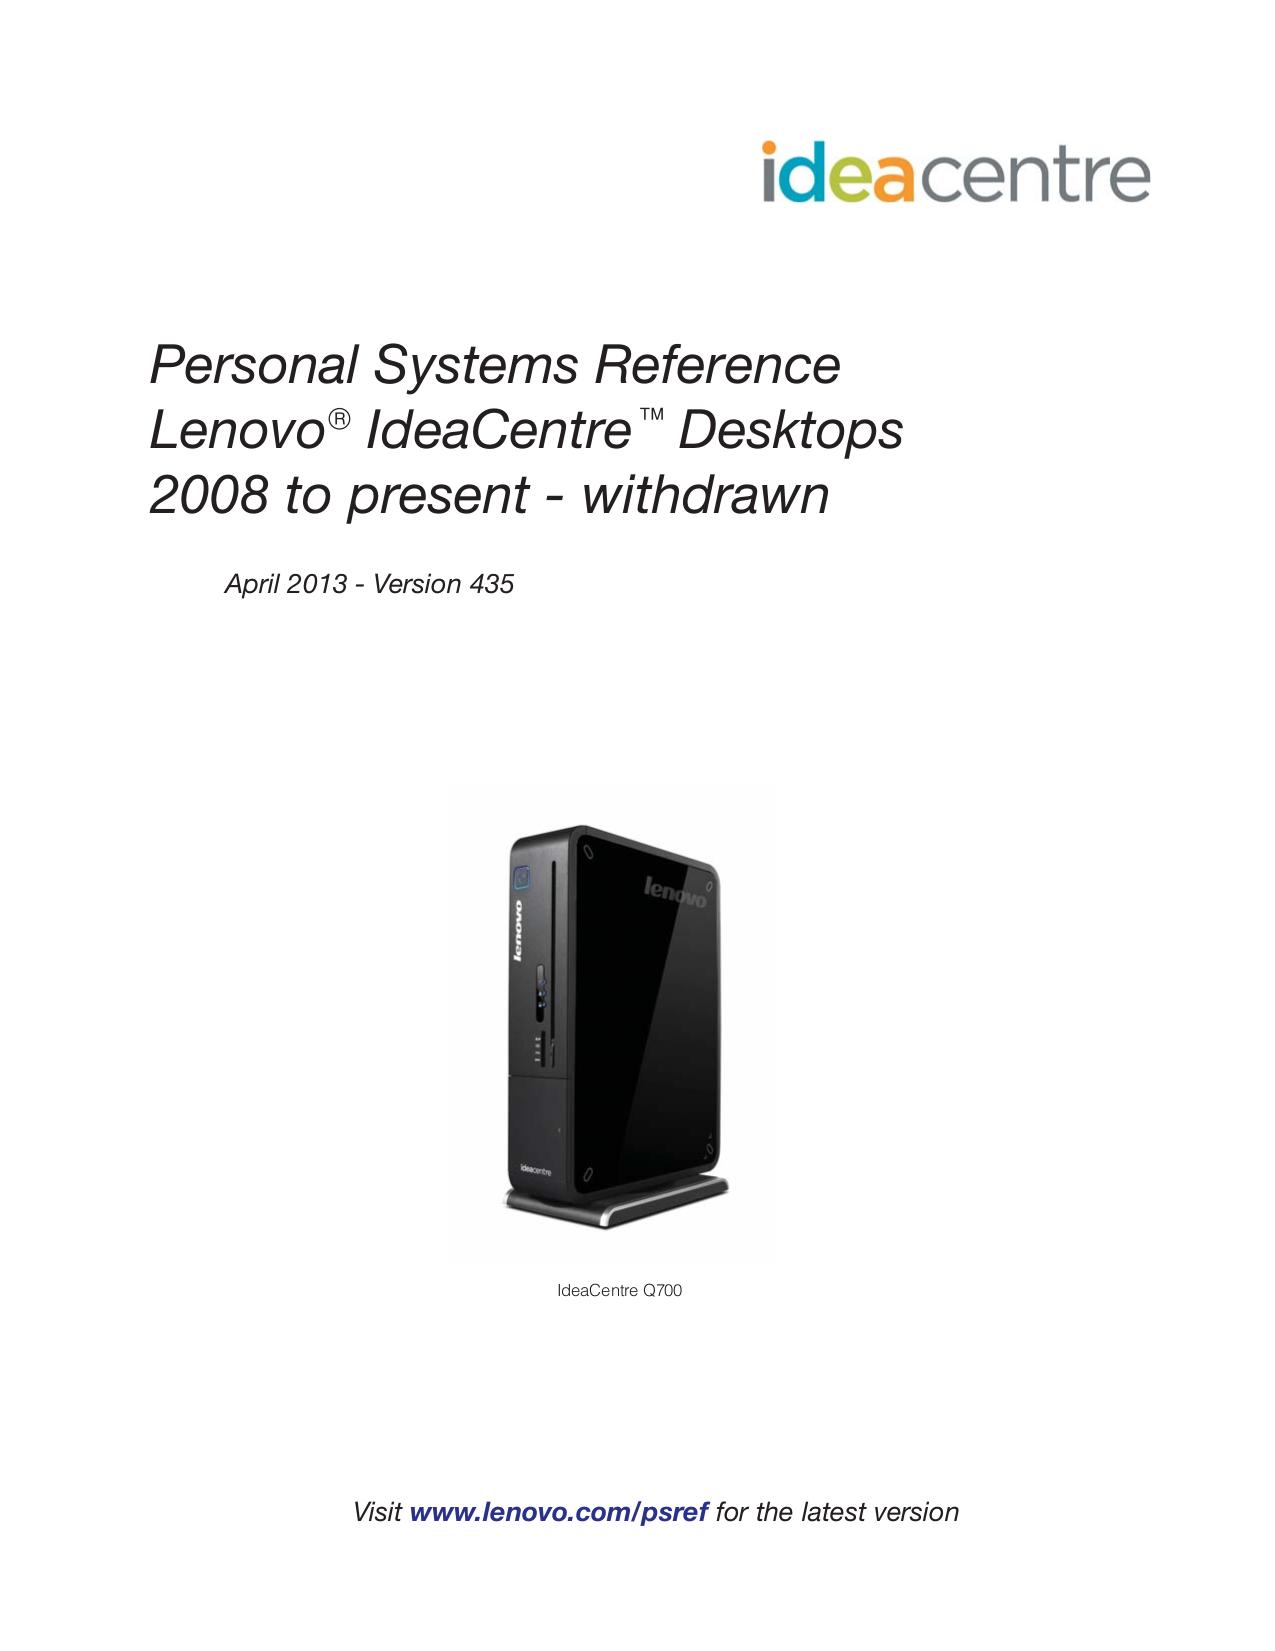 pdf for Lenovo Desktop IdeaCentre Q150 4081 manual